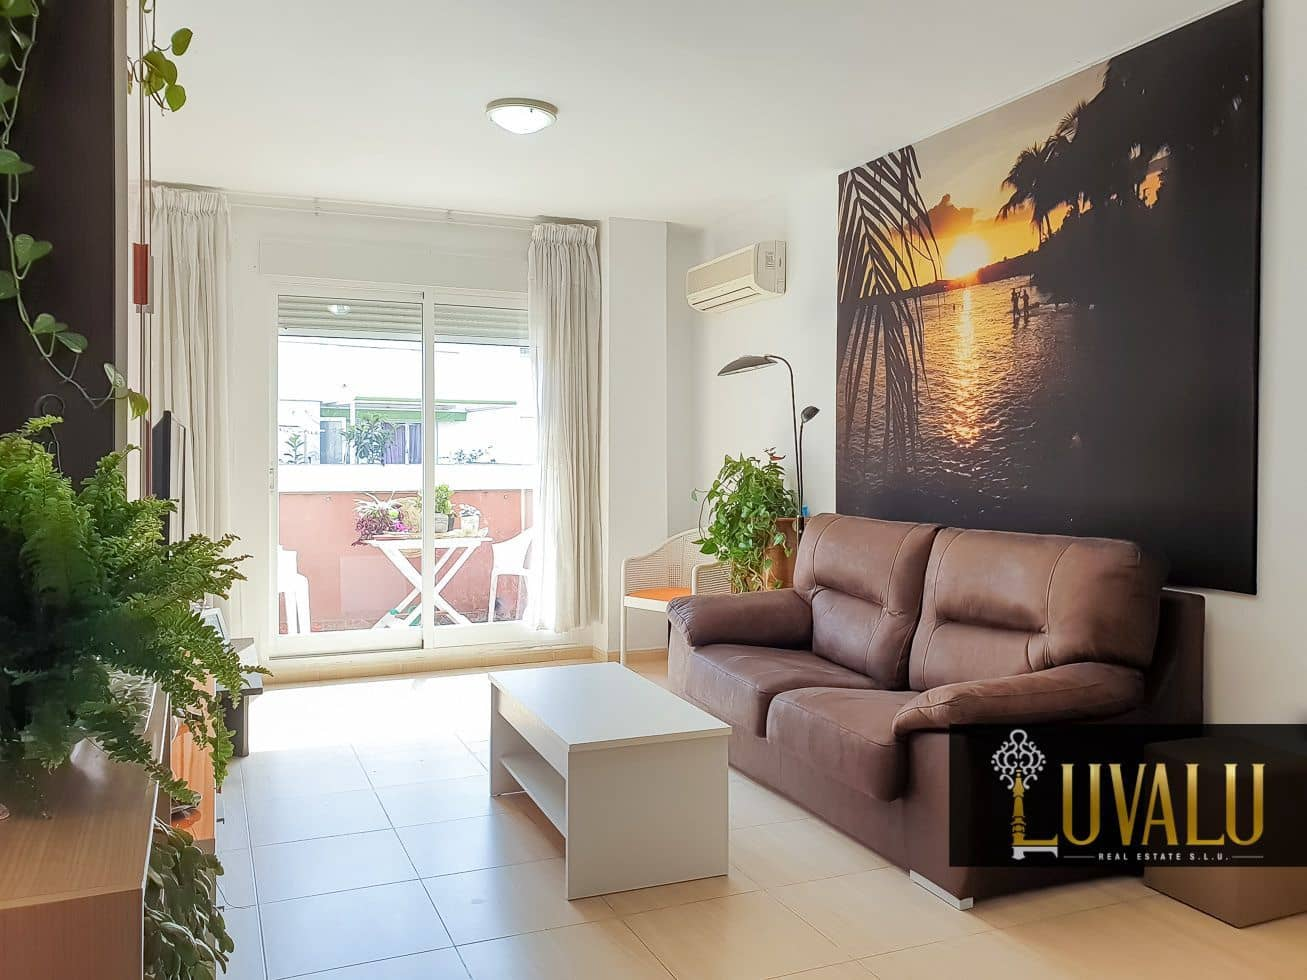 2 chambre Appartement à vendre à Benicarlo - 85 000 € (Ref: 5996439)